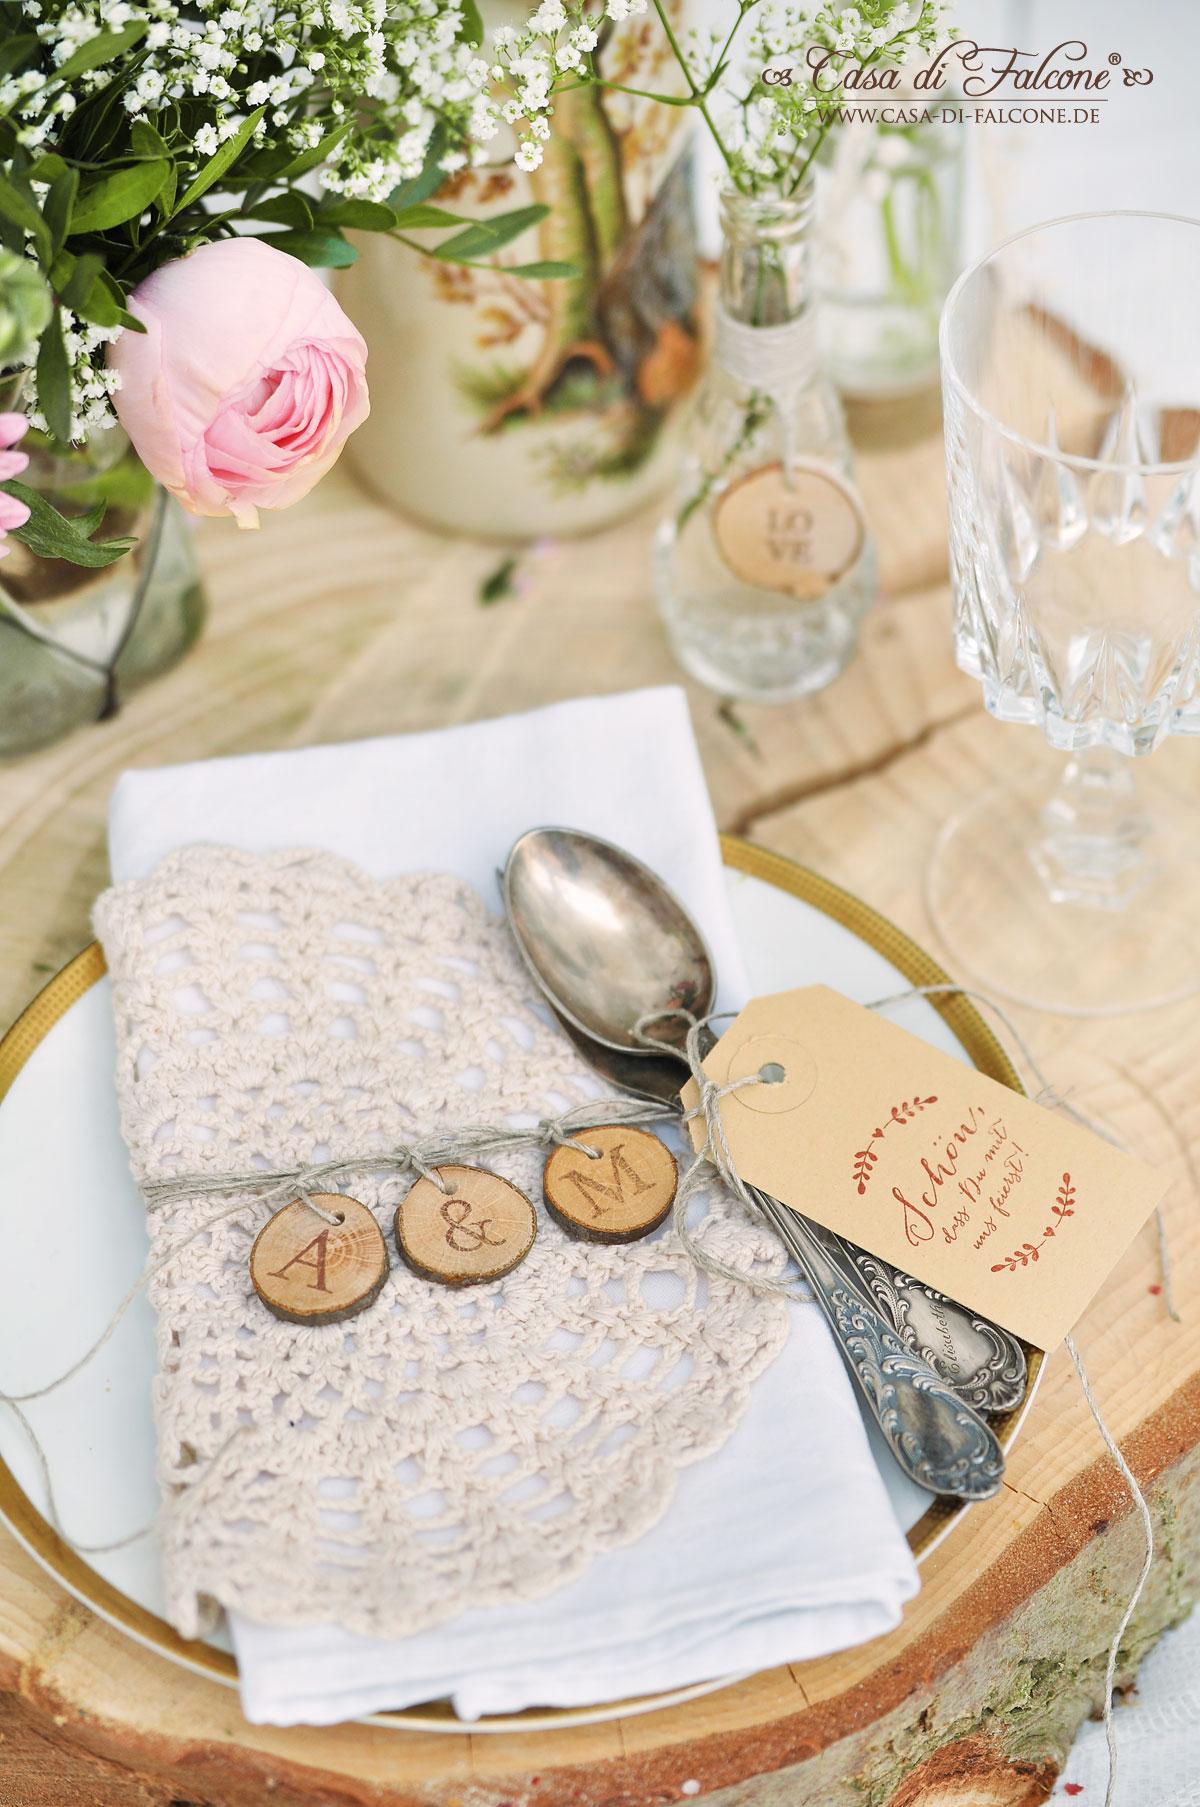 Schoner Heiraten Rustikale Tischdeko Mit Baumscheiben Casa Di Falcone